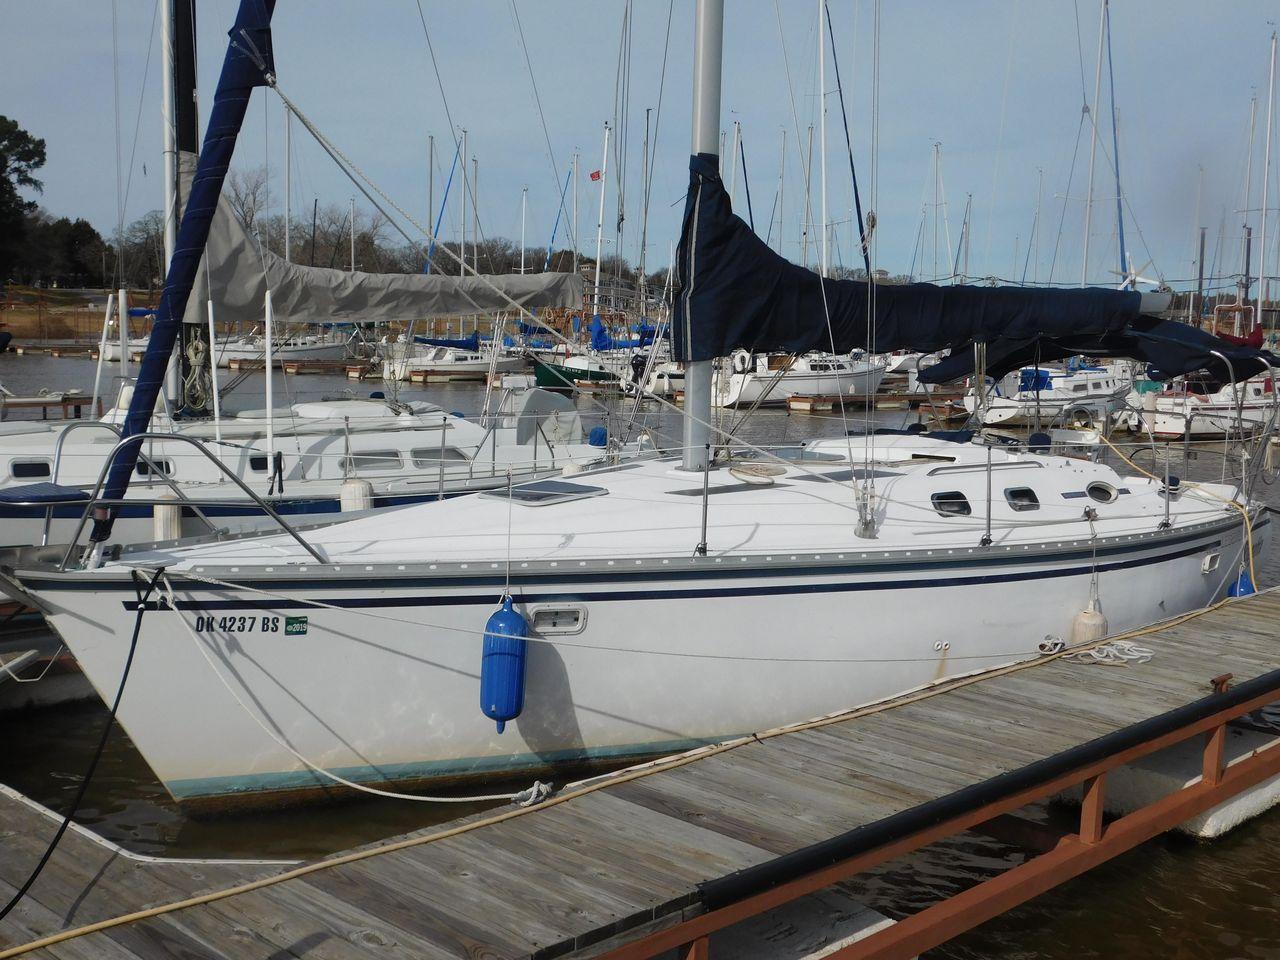 1988 Used Hunter 35 Sloop Sailboat For Sale 19 500 Gordonville